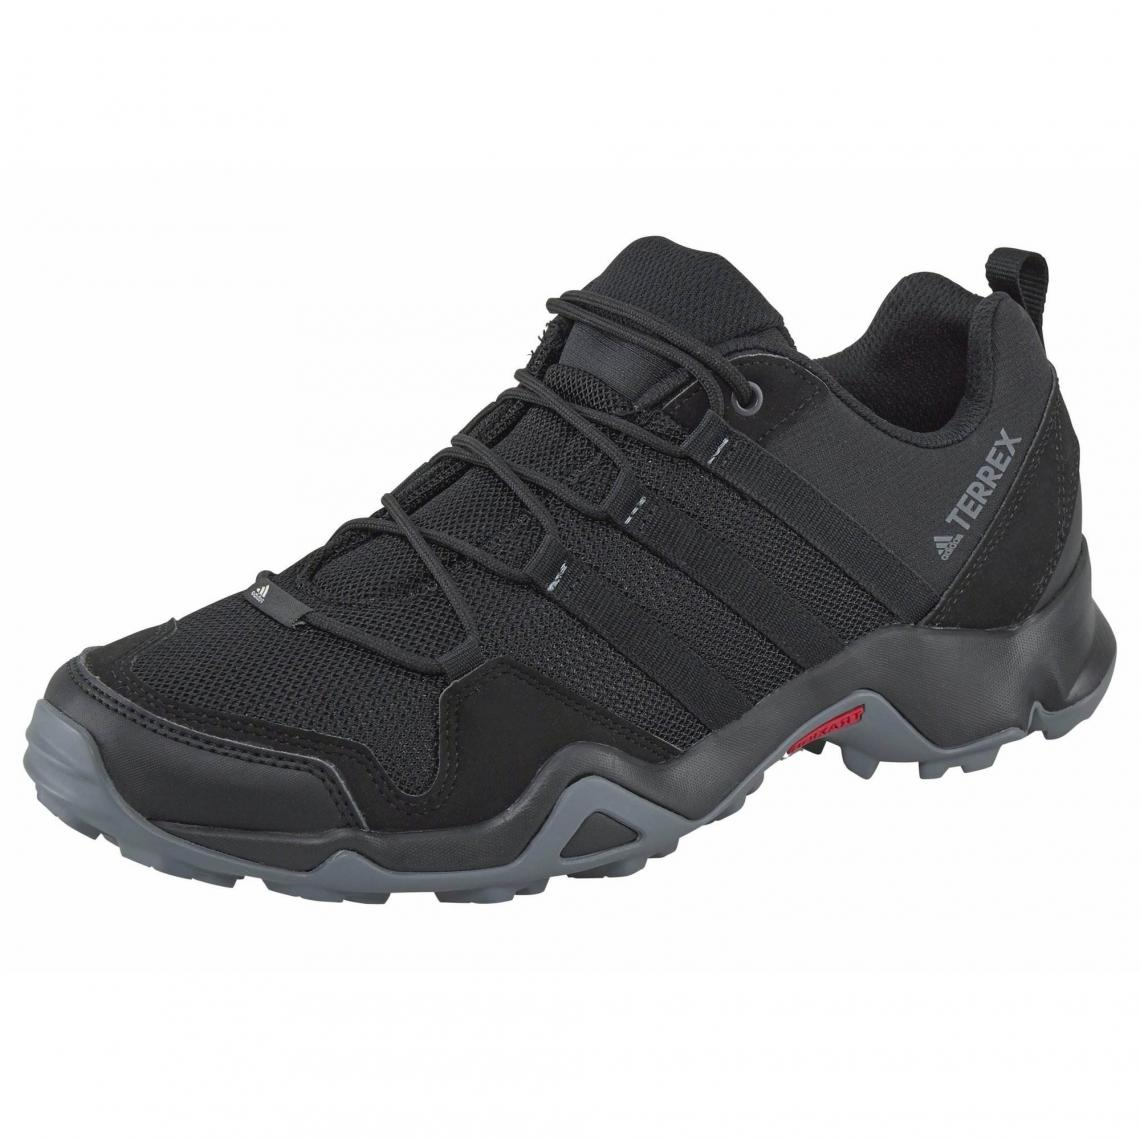 best sneakers 3ef9f 66a36 adidas chaussure randonnée. adidas Performance Terrex AX2R chaussures de randonnée  homme ...